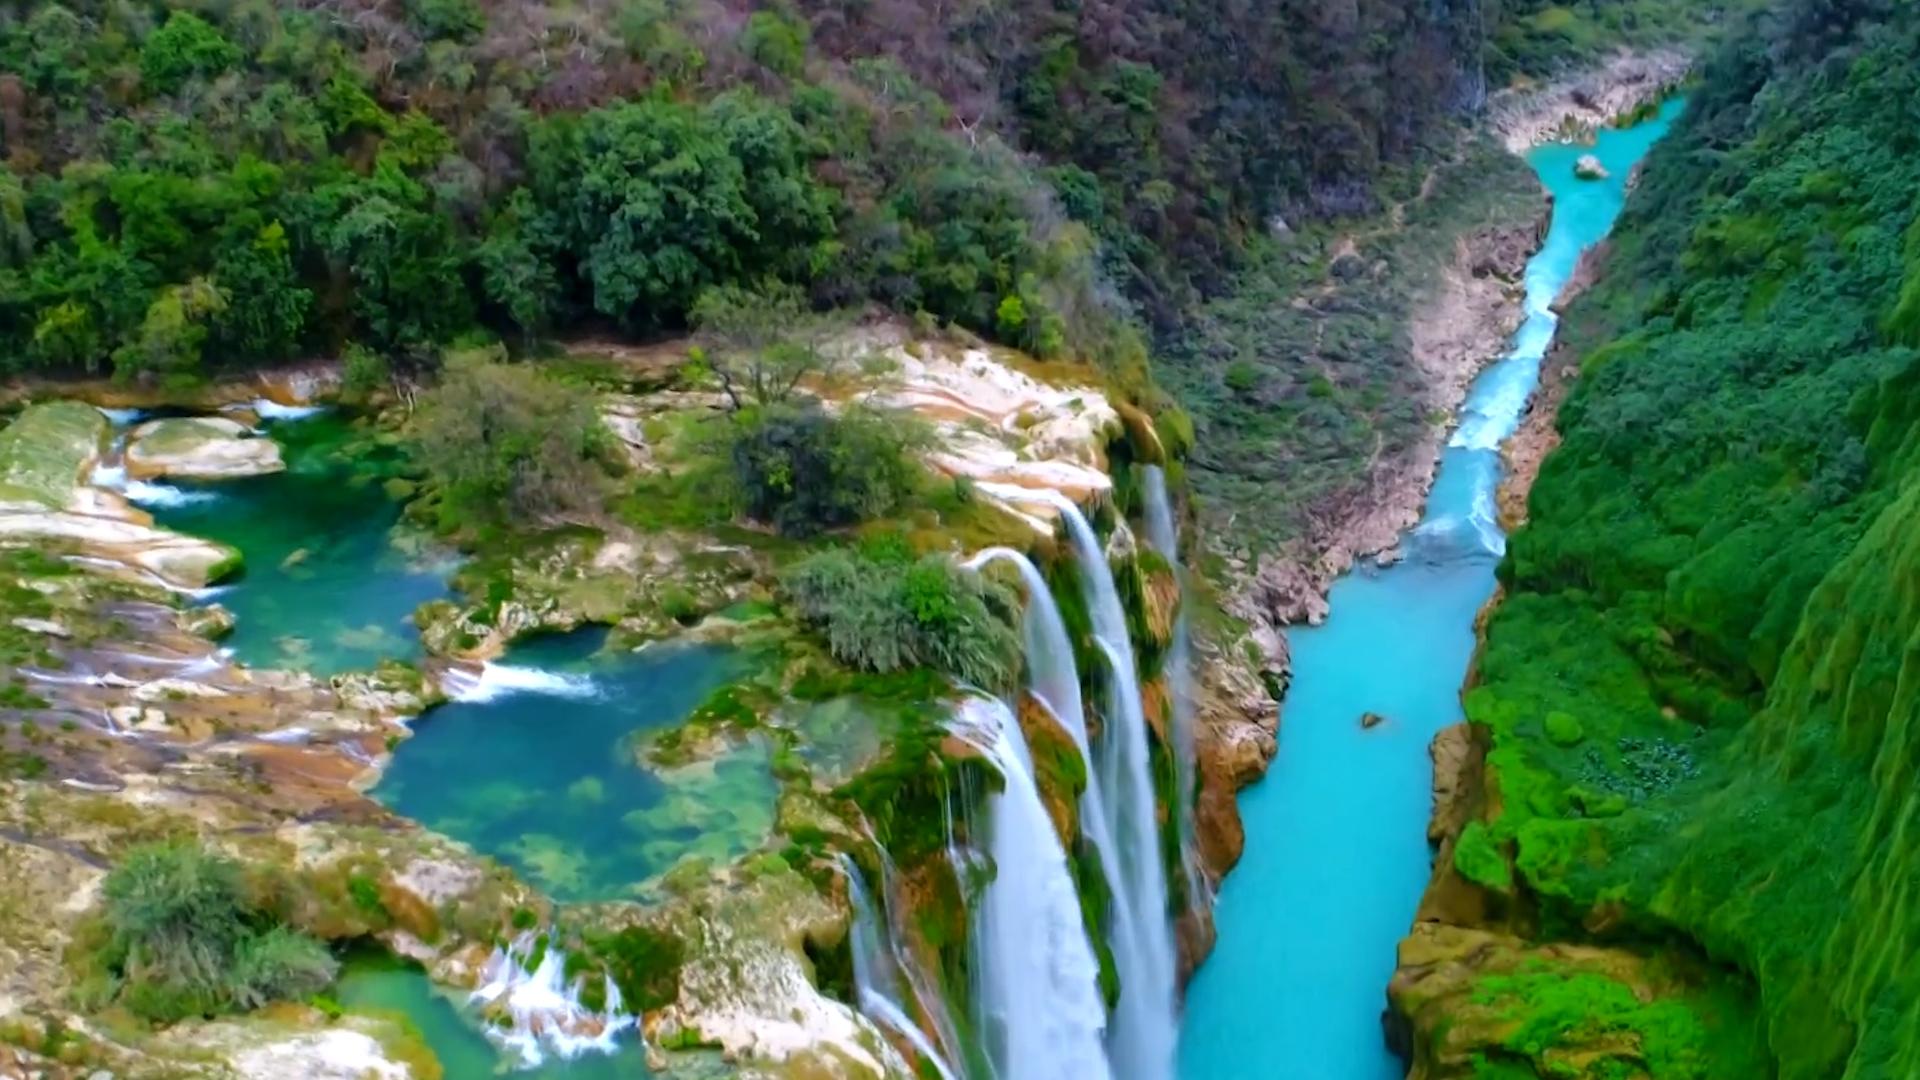 Explore The Oasis Of La Huasteca Potosina Falls In Mexico